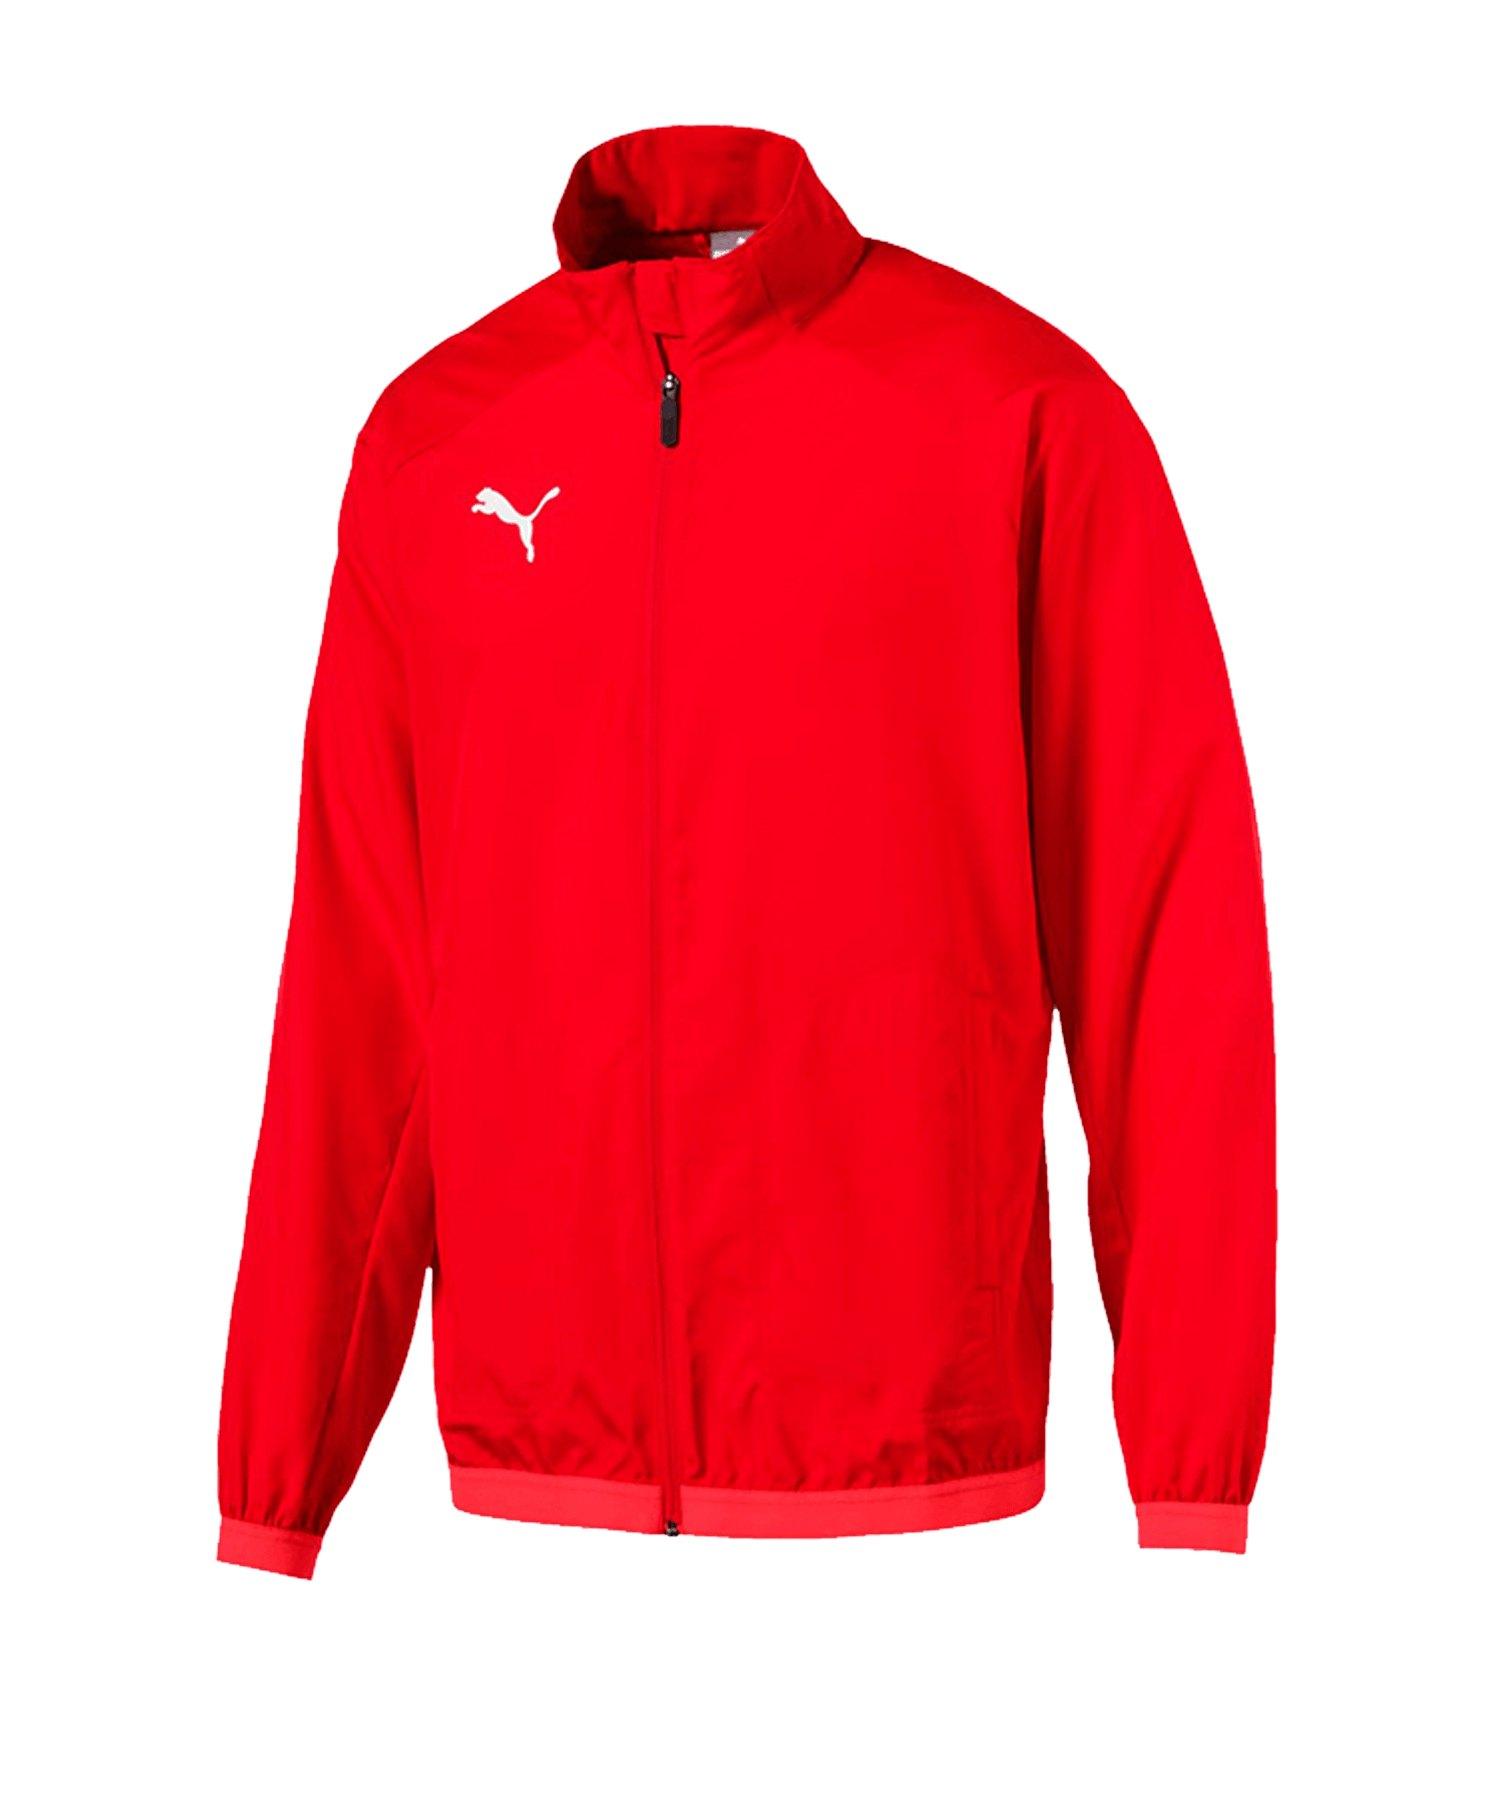 PUMA LIGA Sideline Jacket Jacke Rot Weiss F01 - rot